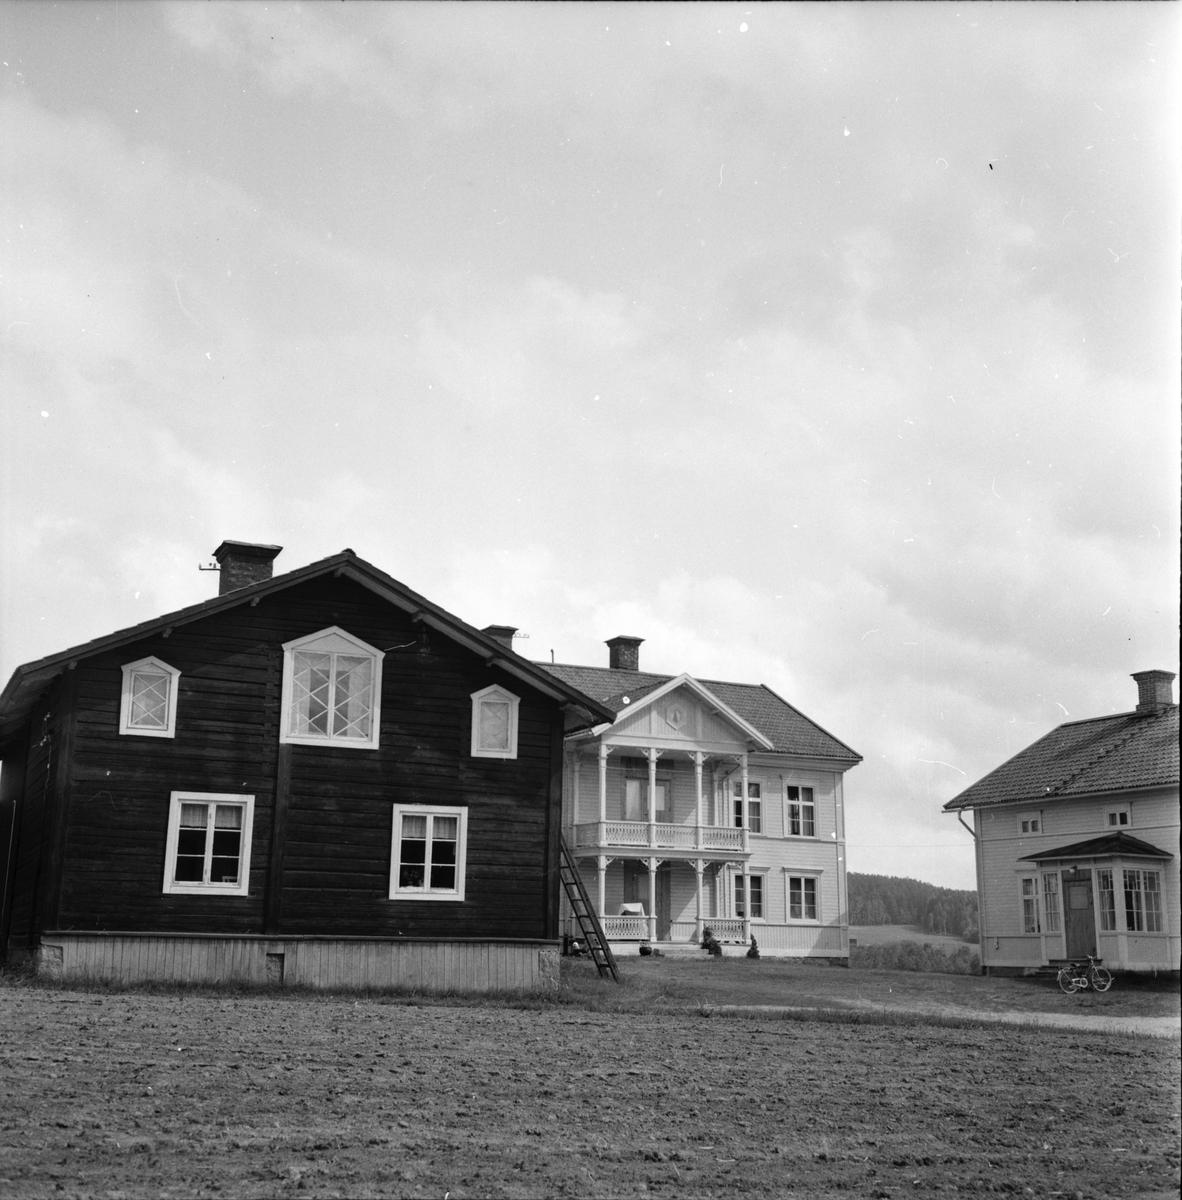 Växbo, Ryamatta, Vyer,Naturbilder, Wallins, 4 Juli 1962